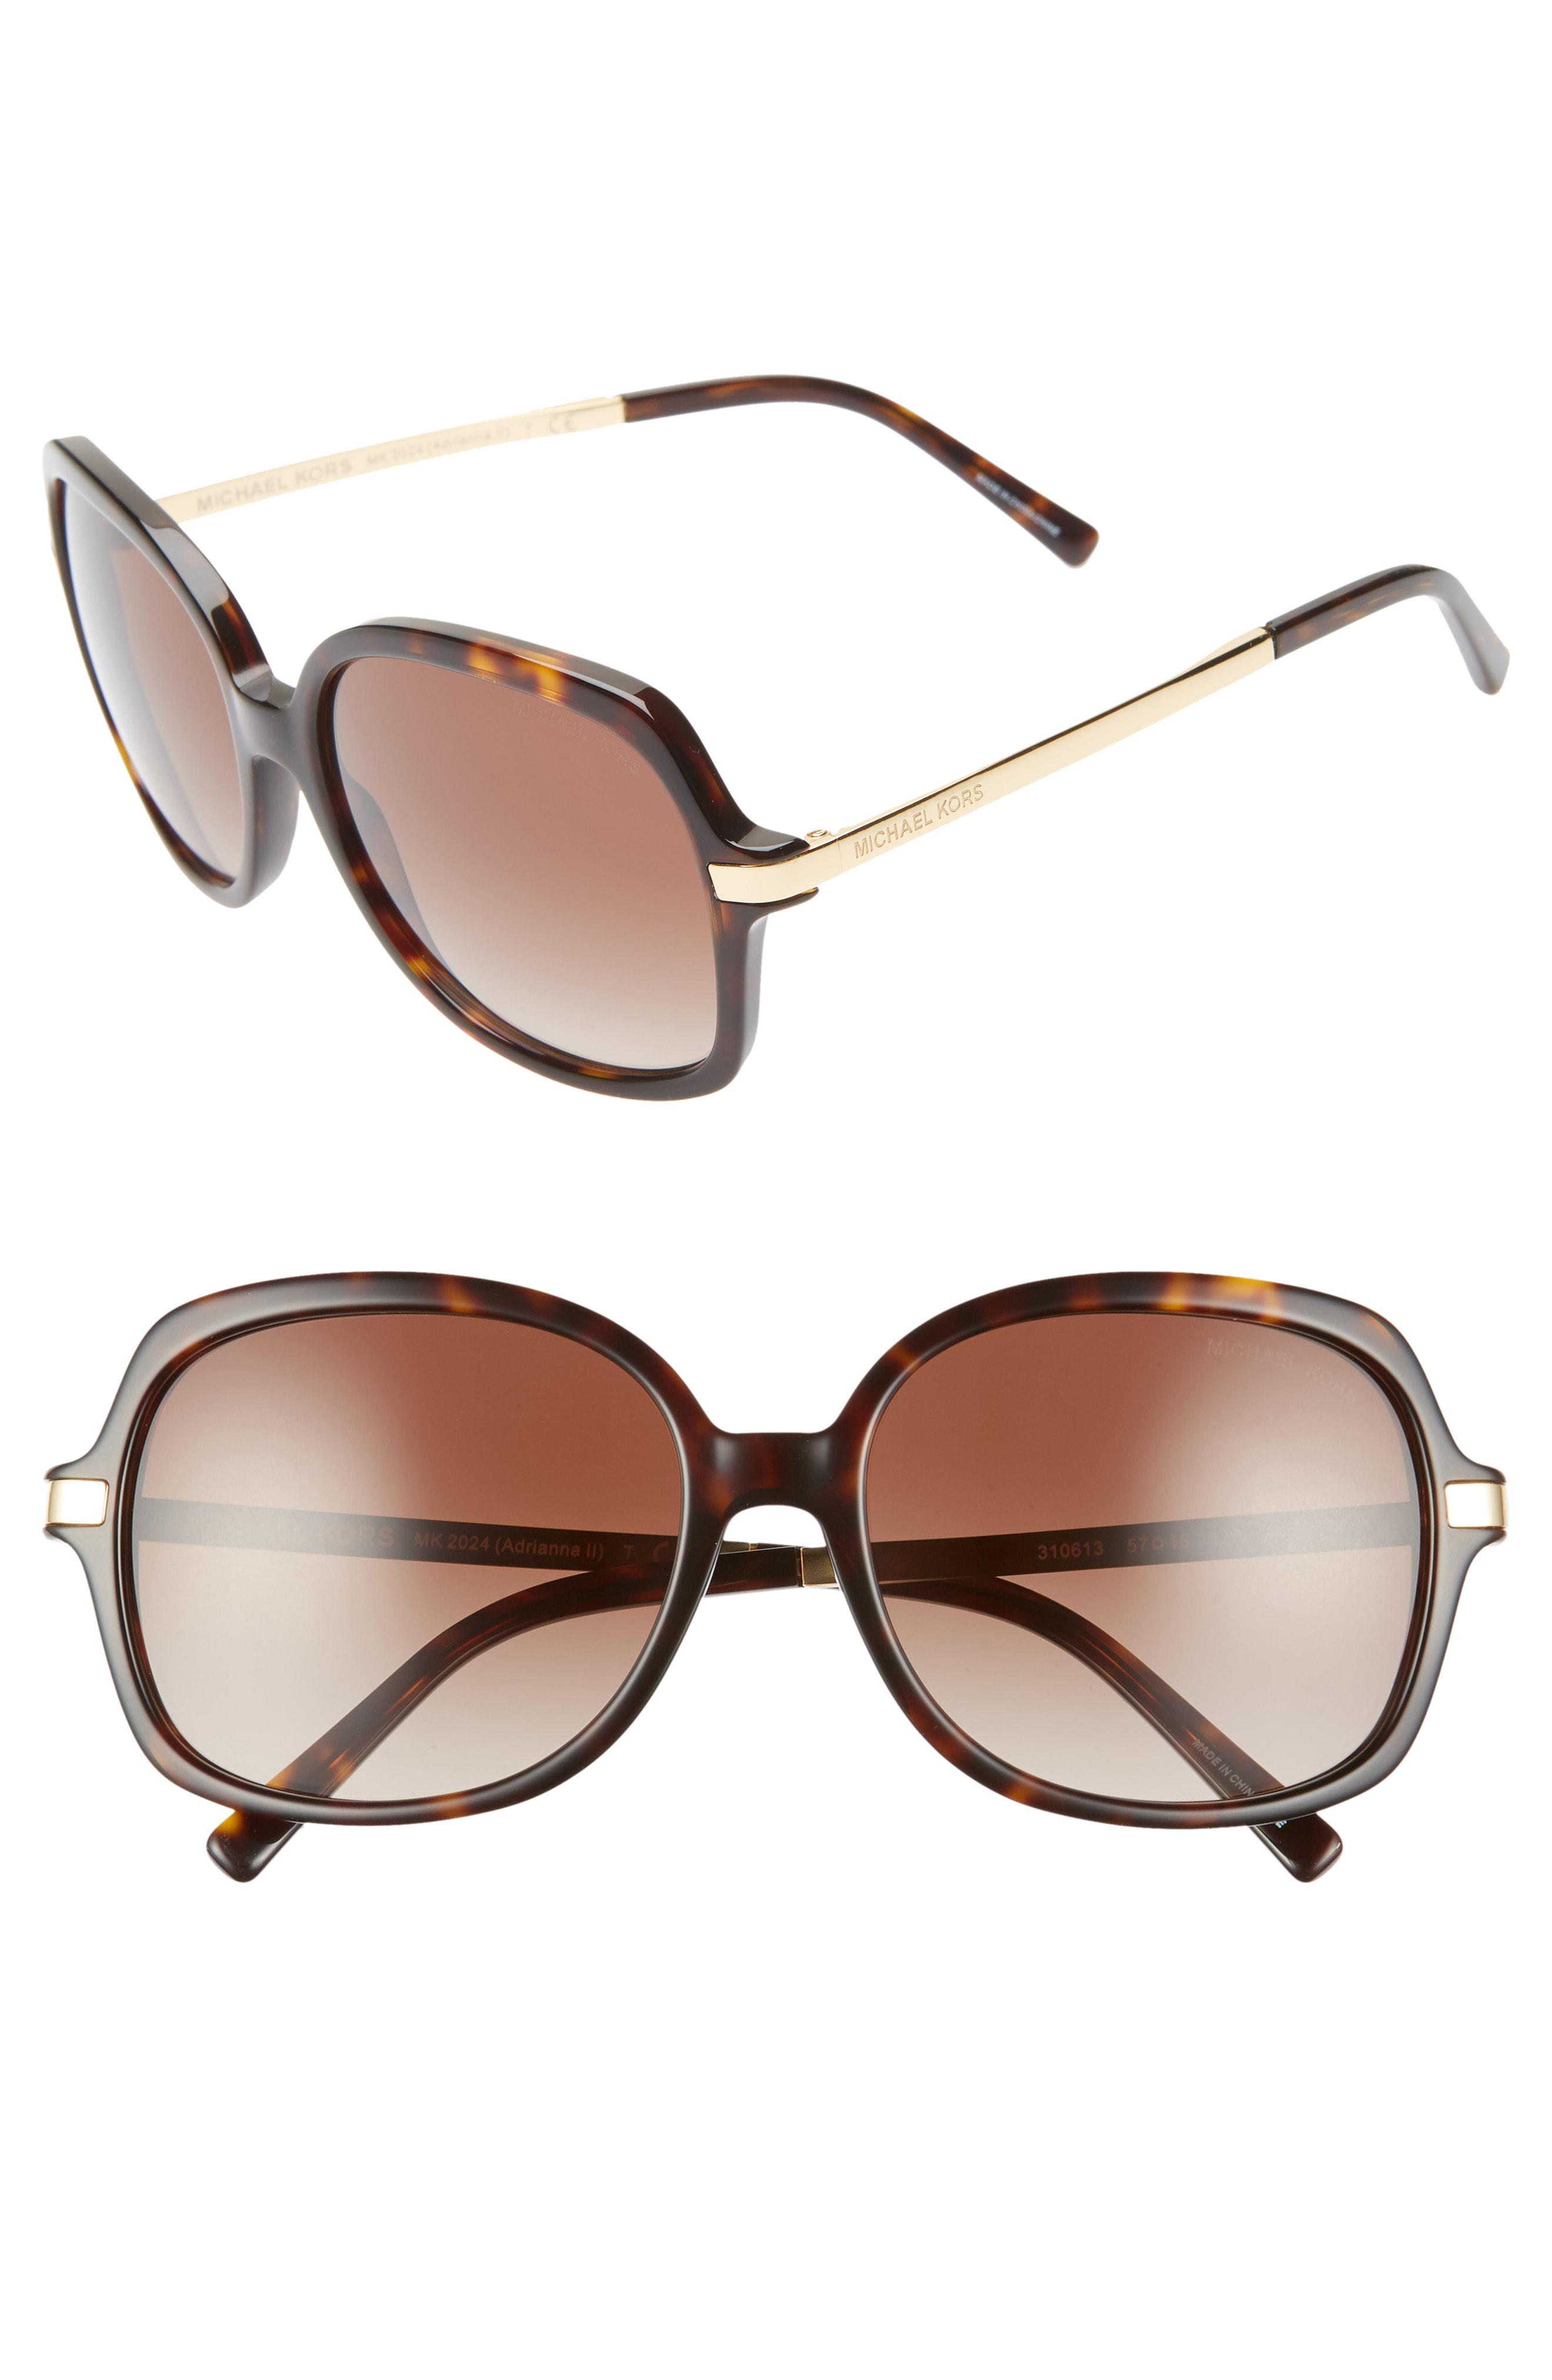 93c4a1970b5 Michael Kors - Brown 57mm Gradient Square Sunglasses - - Lyst. View  fullscreen